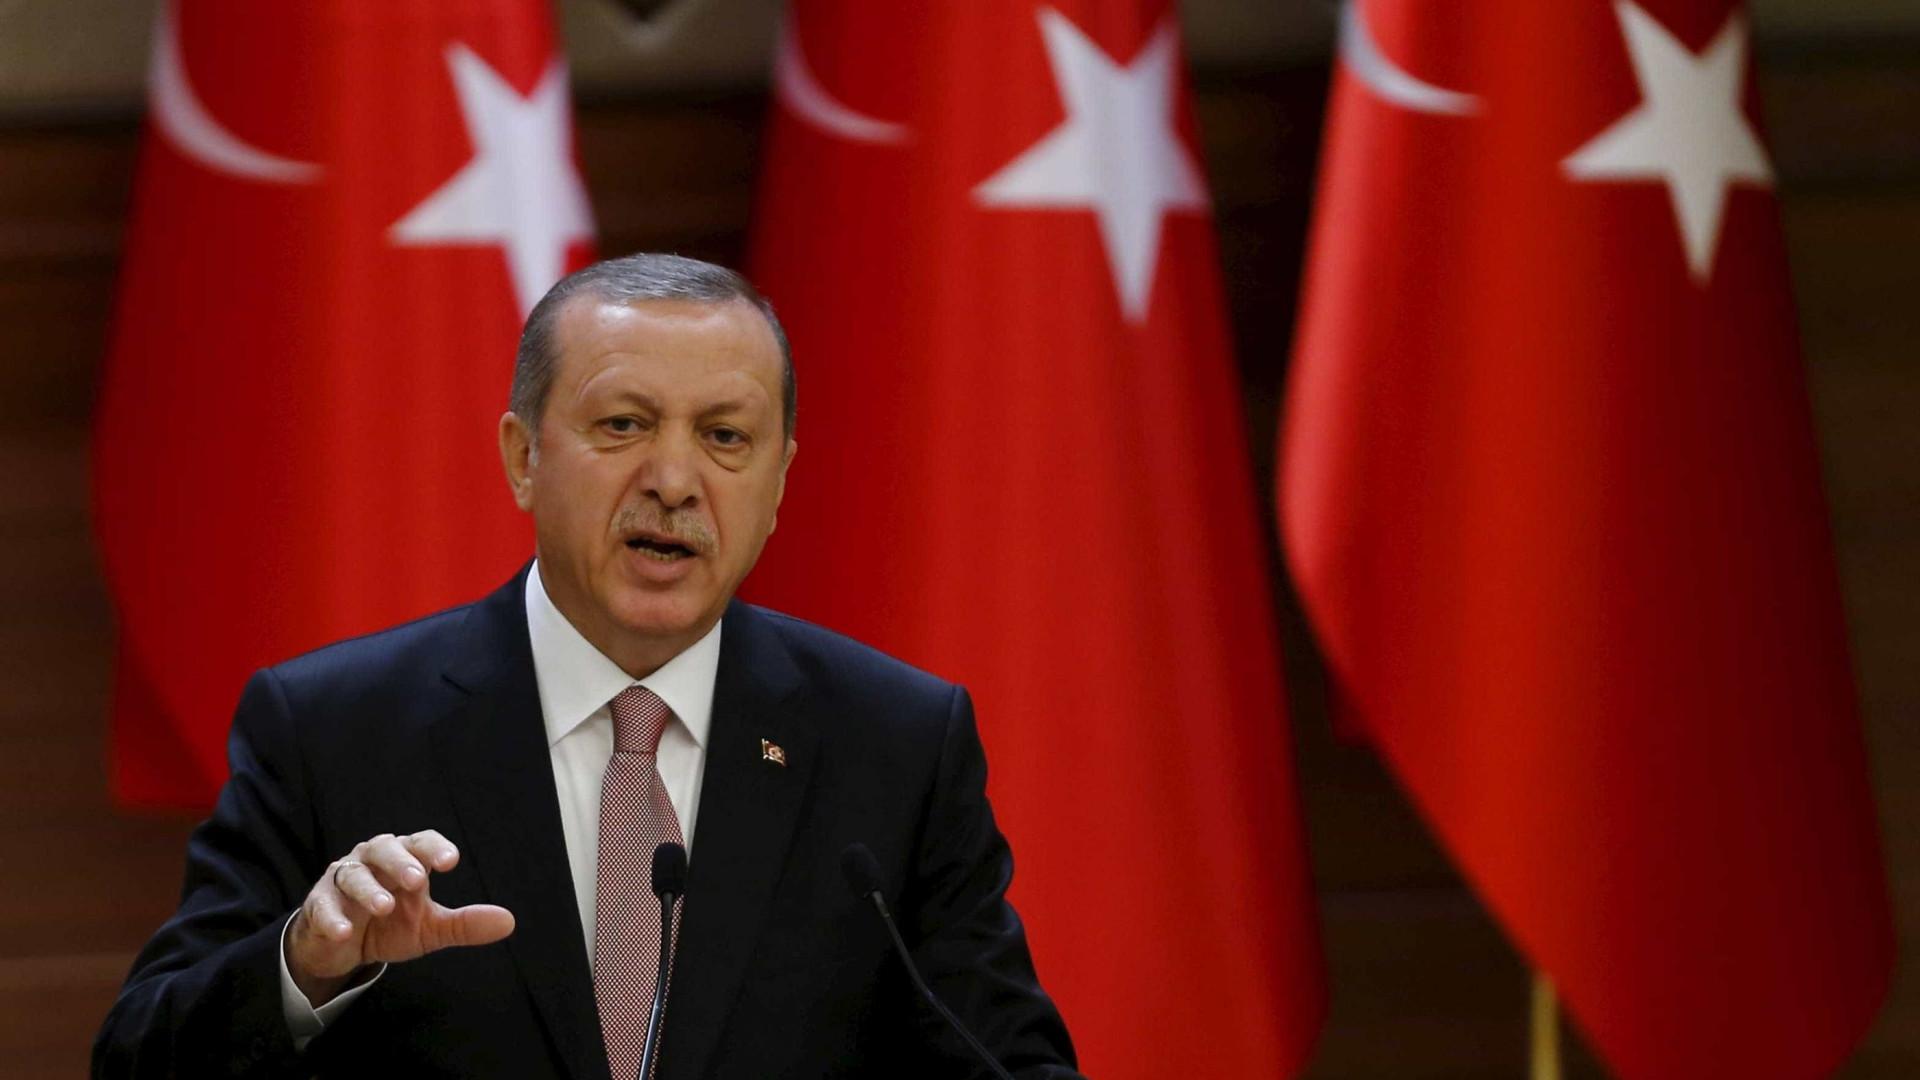 Erdogan confirma presença de combatentes sírios pró-Ancara na Líbia